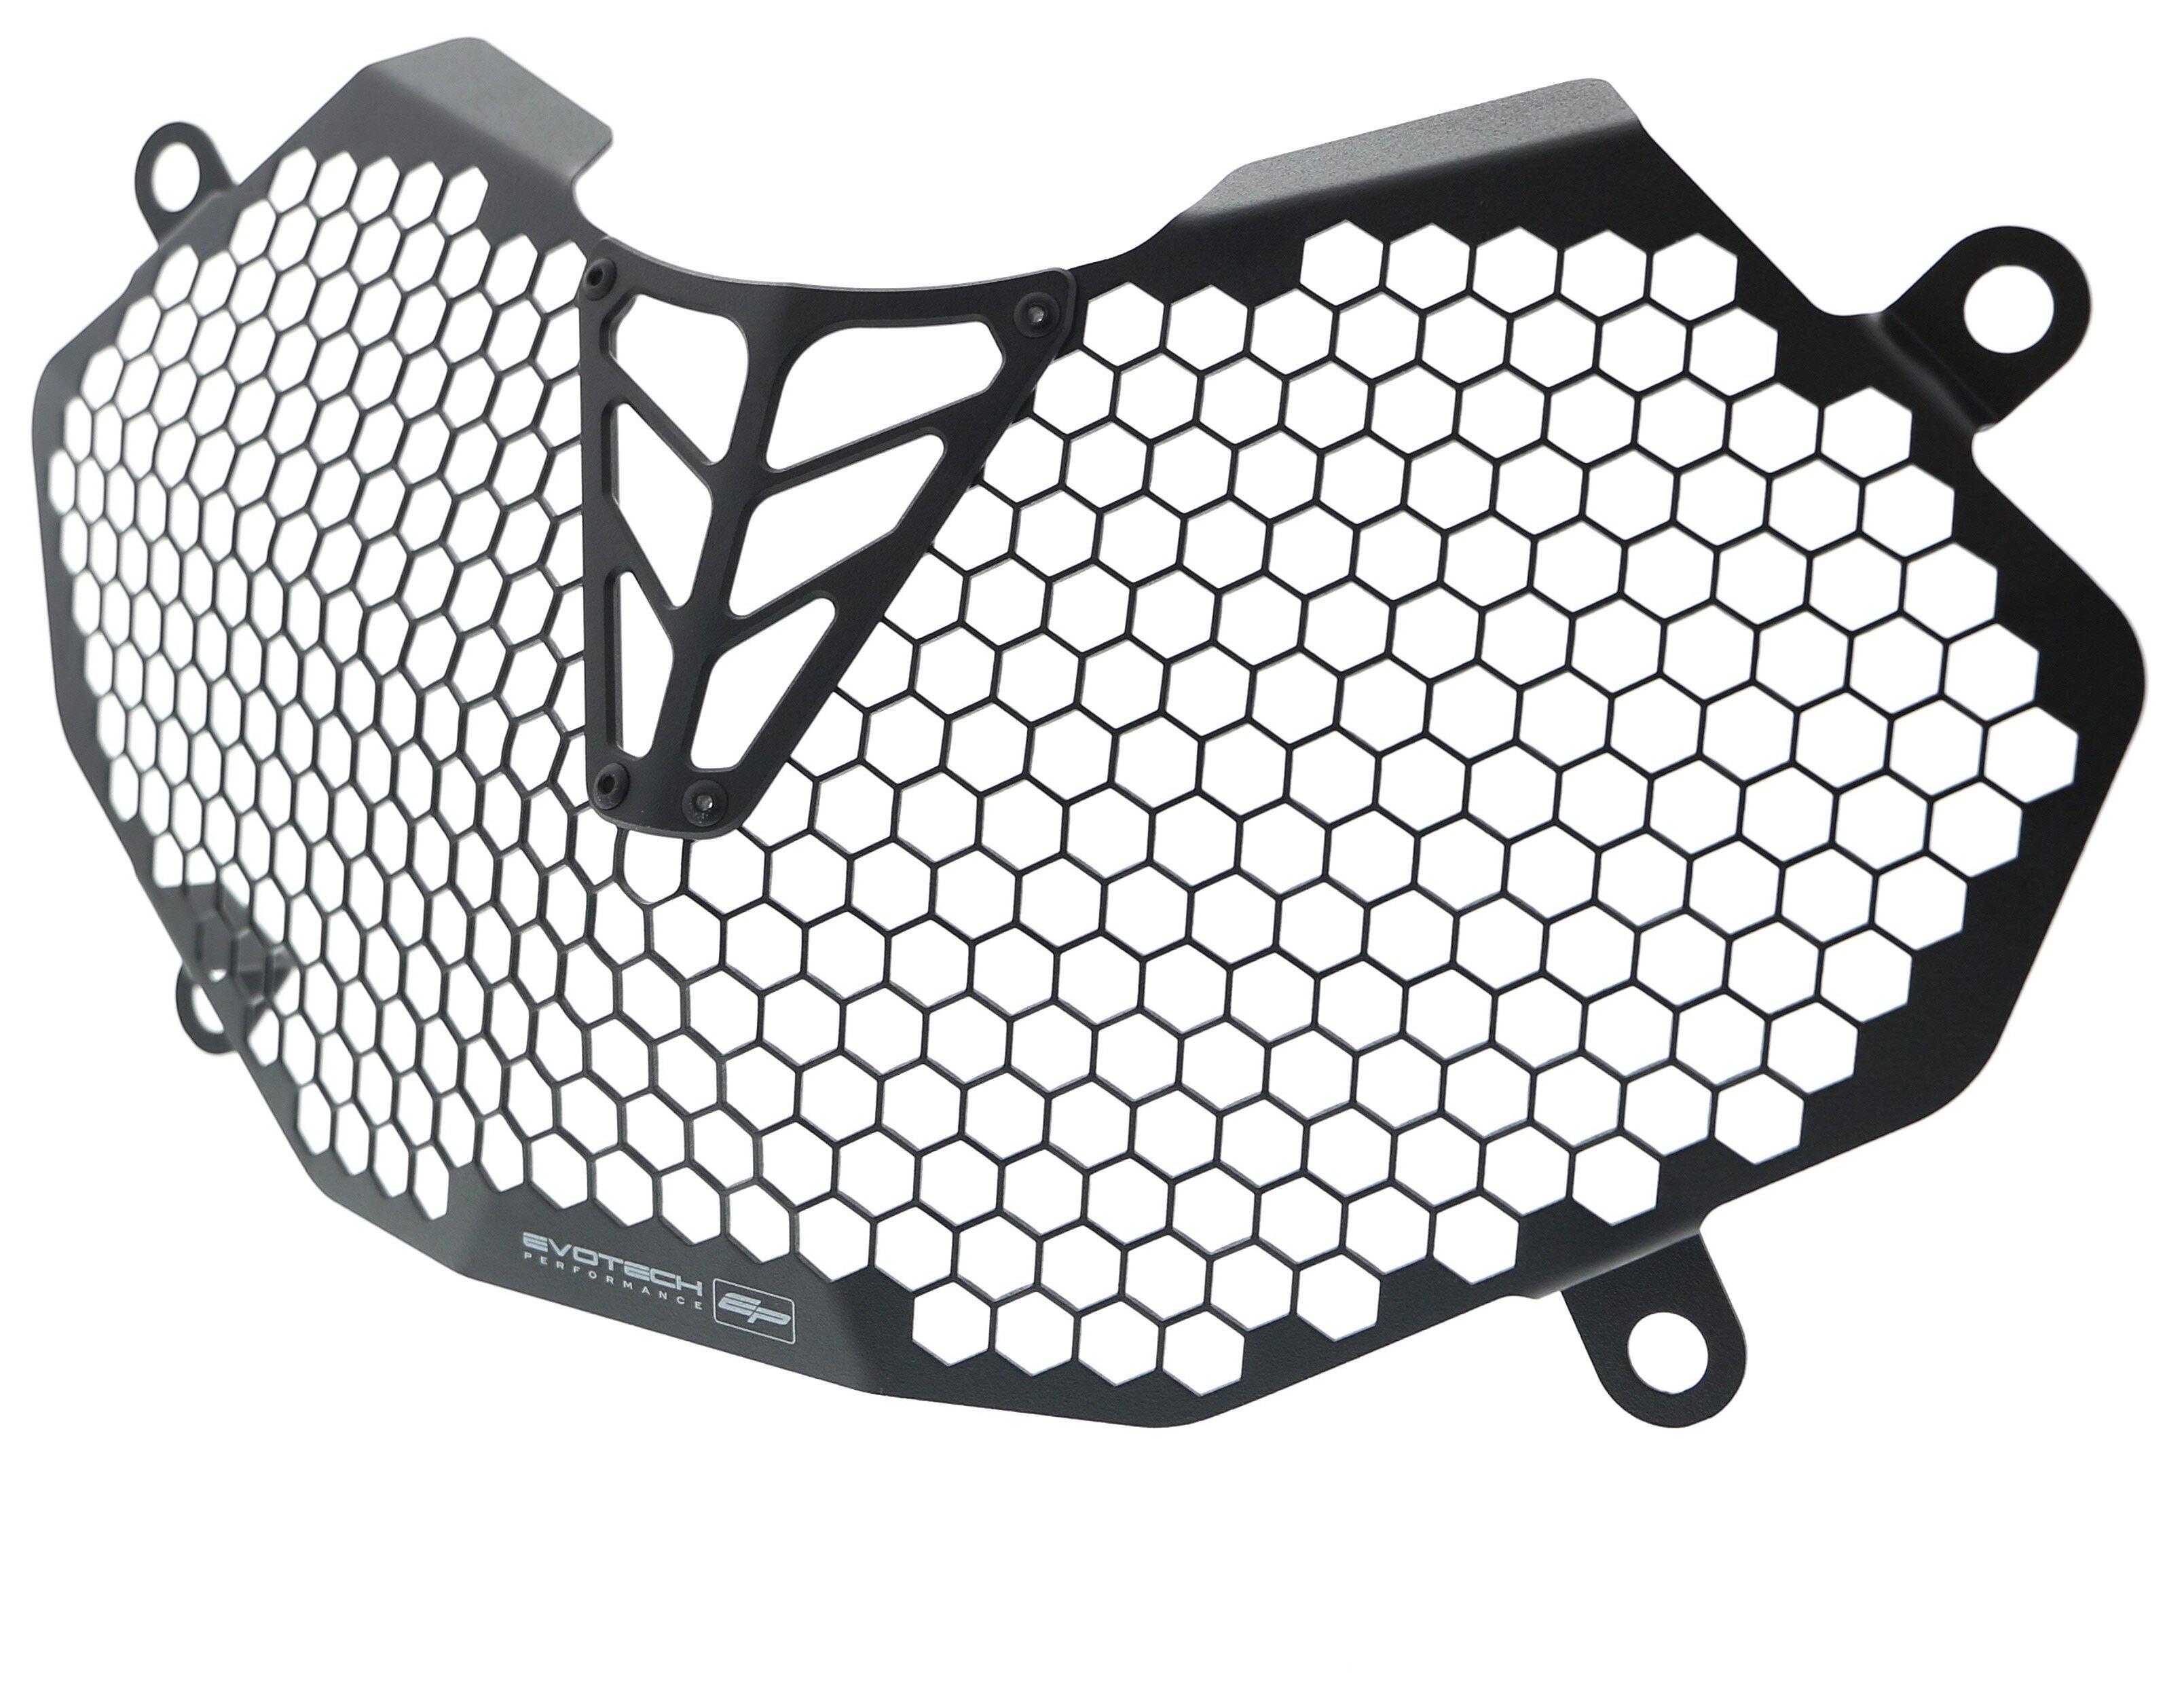 Evotech Performance Headlight Guard Triumph Explorer 1200